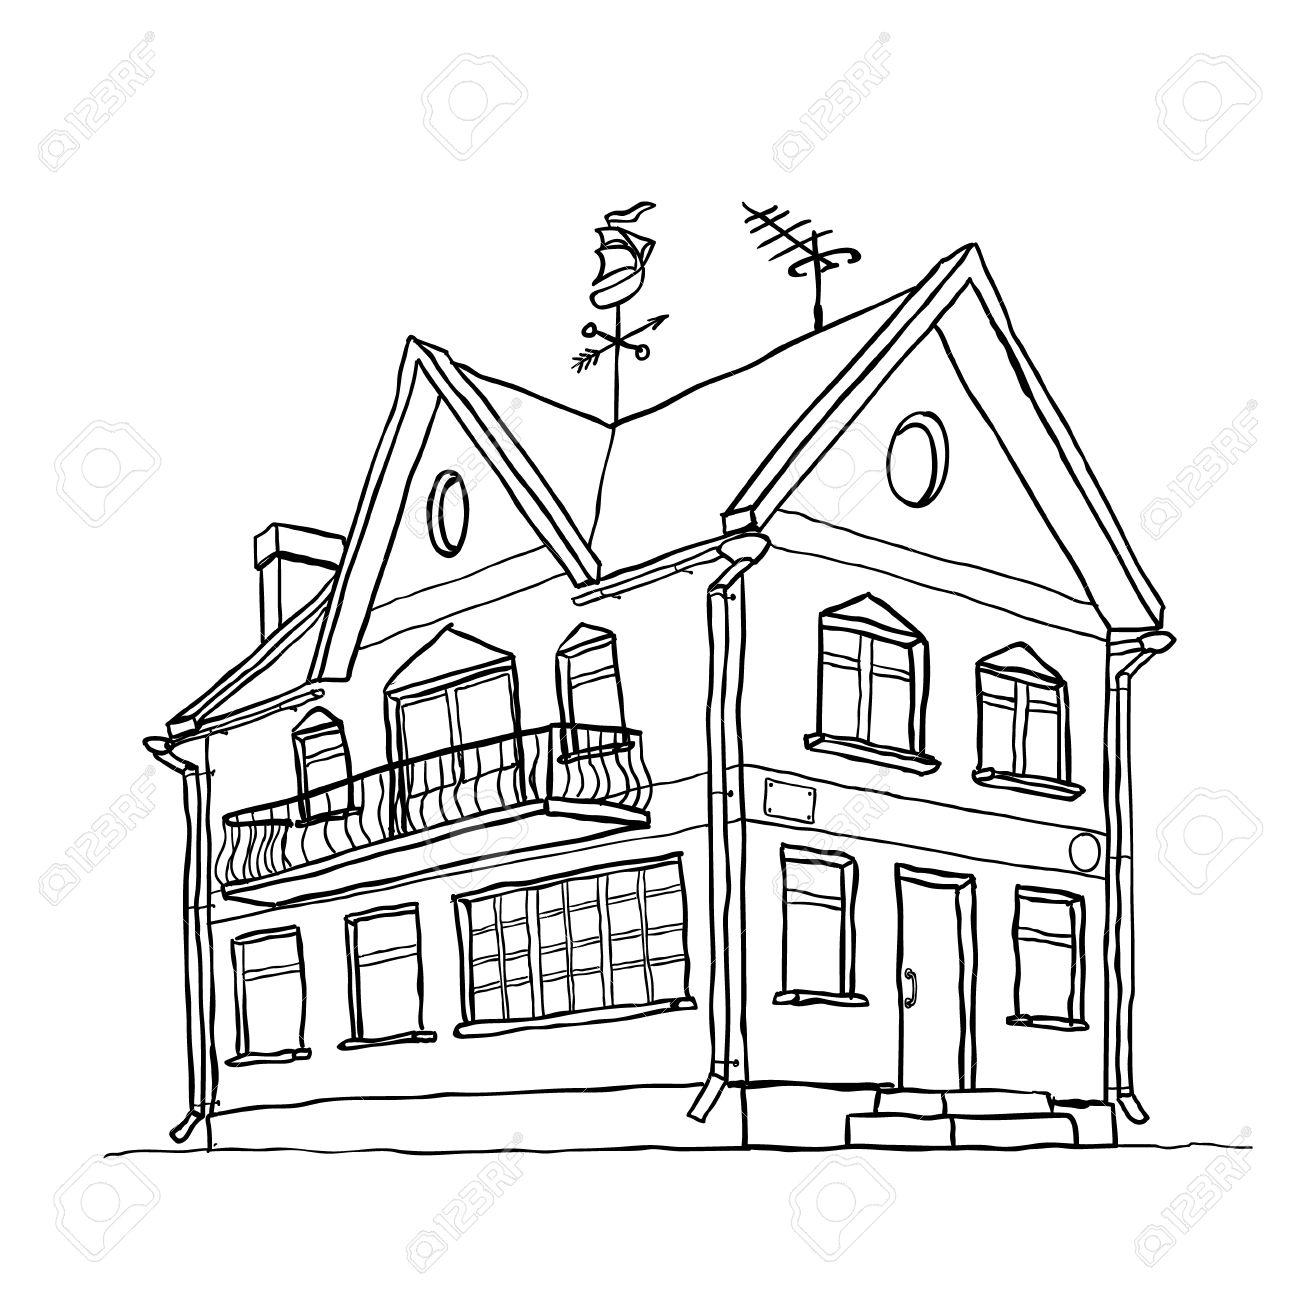 Beach House Drawing At Getdrawings